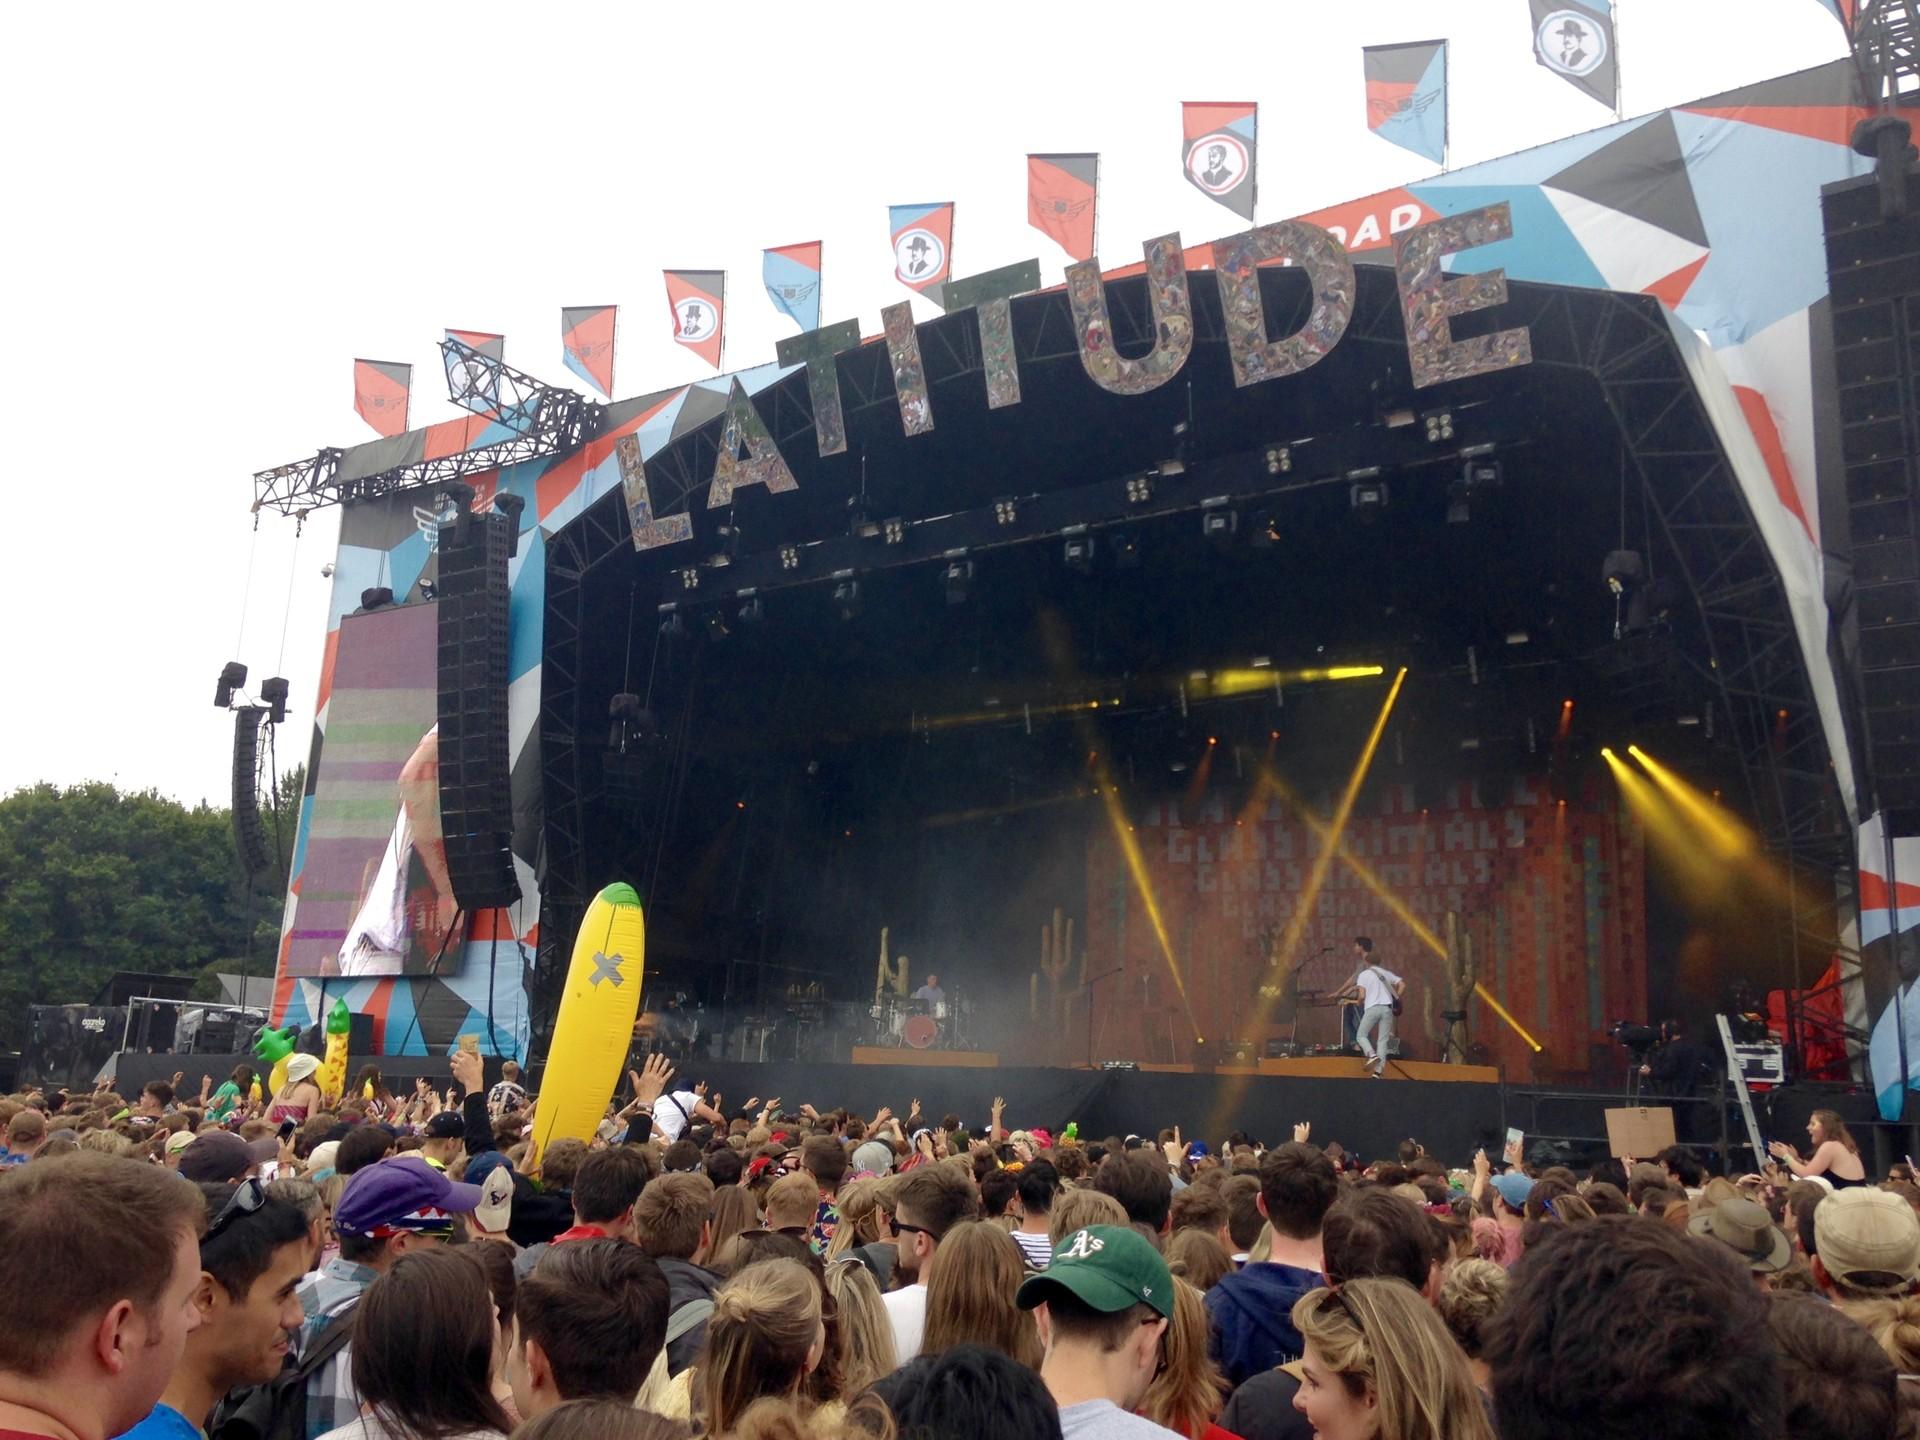 latitude-festival-40a9ce6beae9b37b94af2d